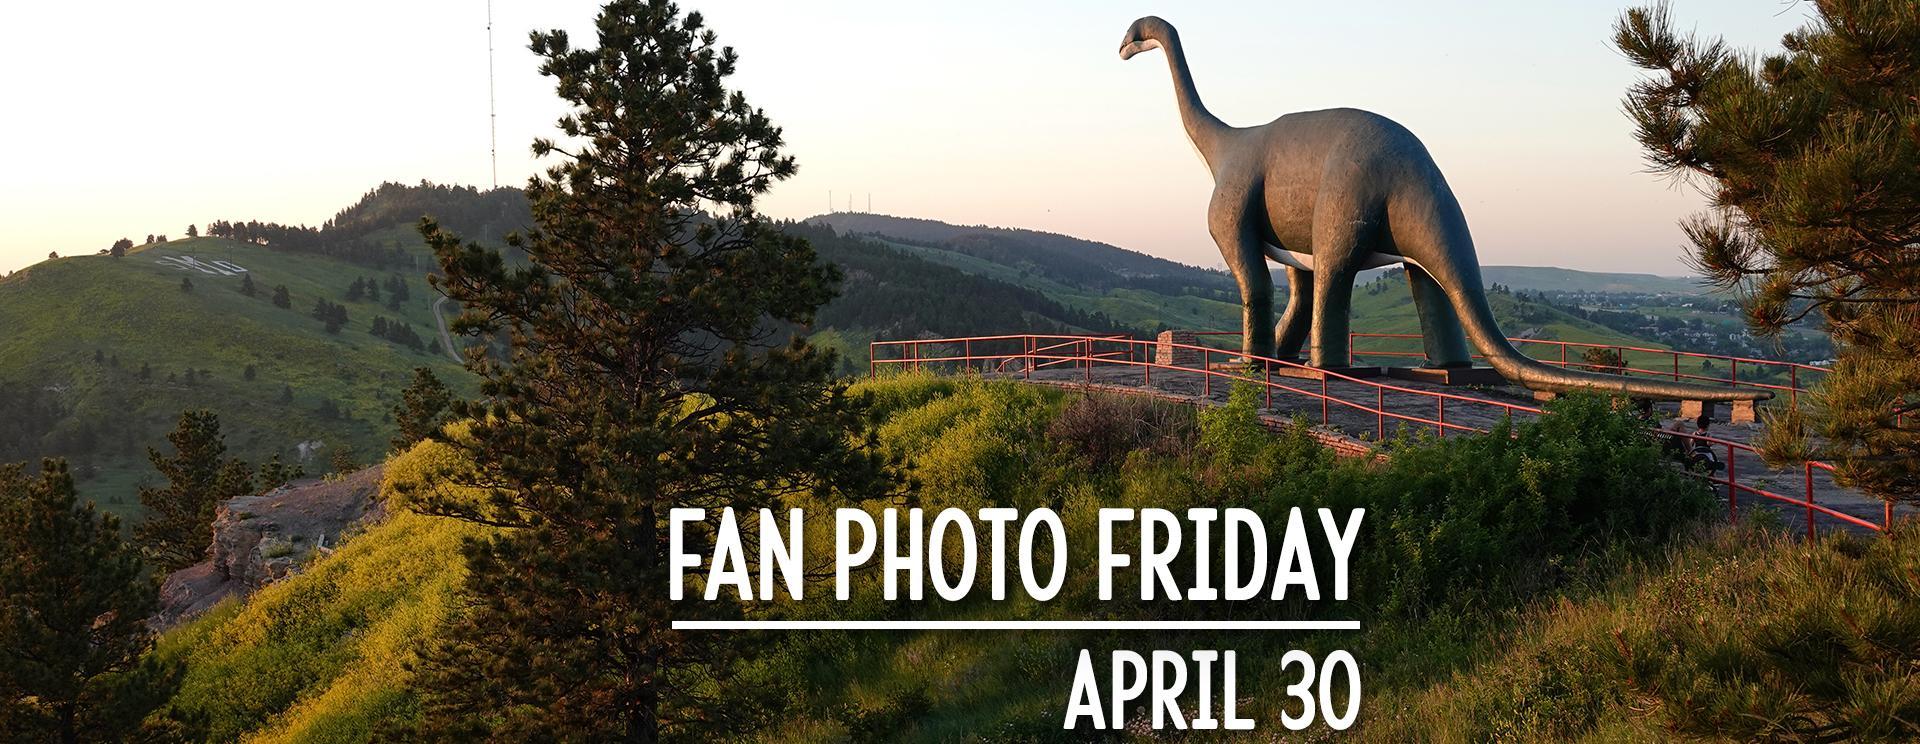 Fan Photo Friday   April 30, 2021